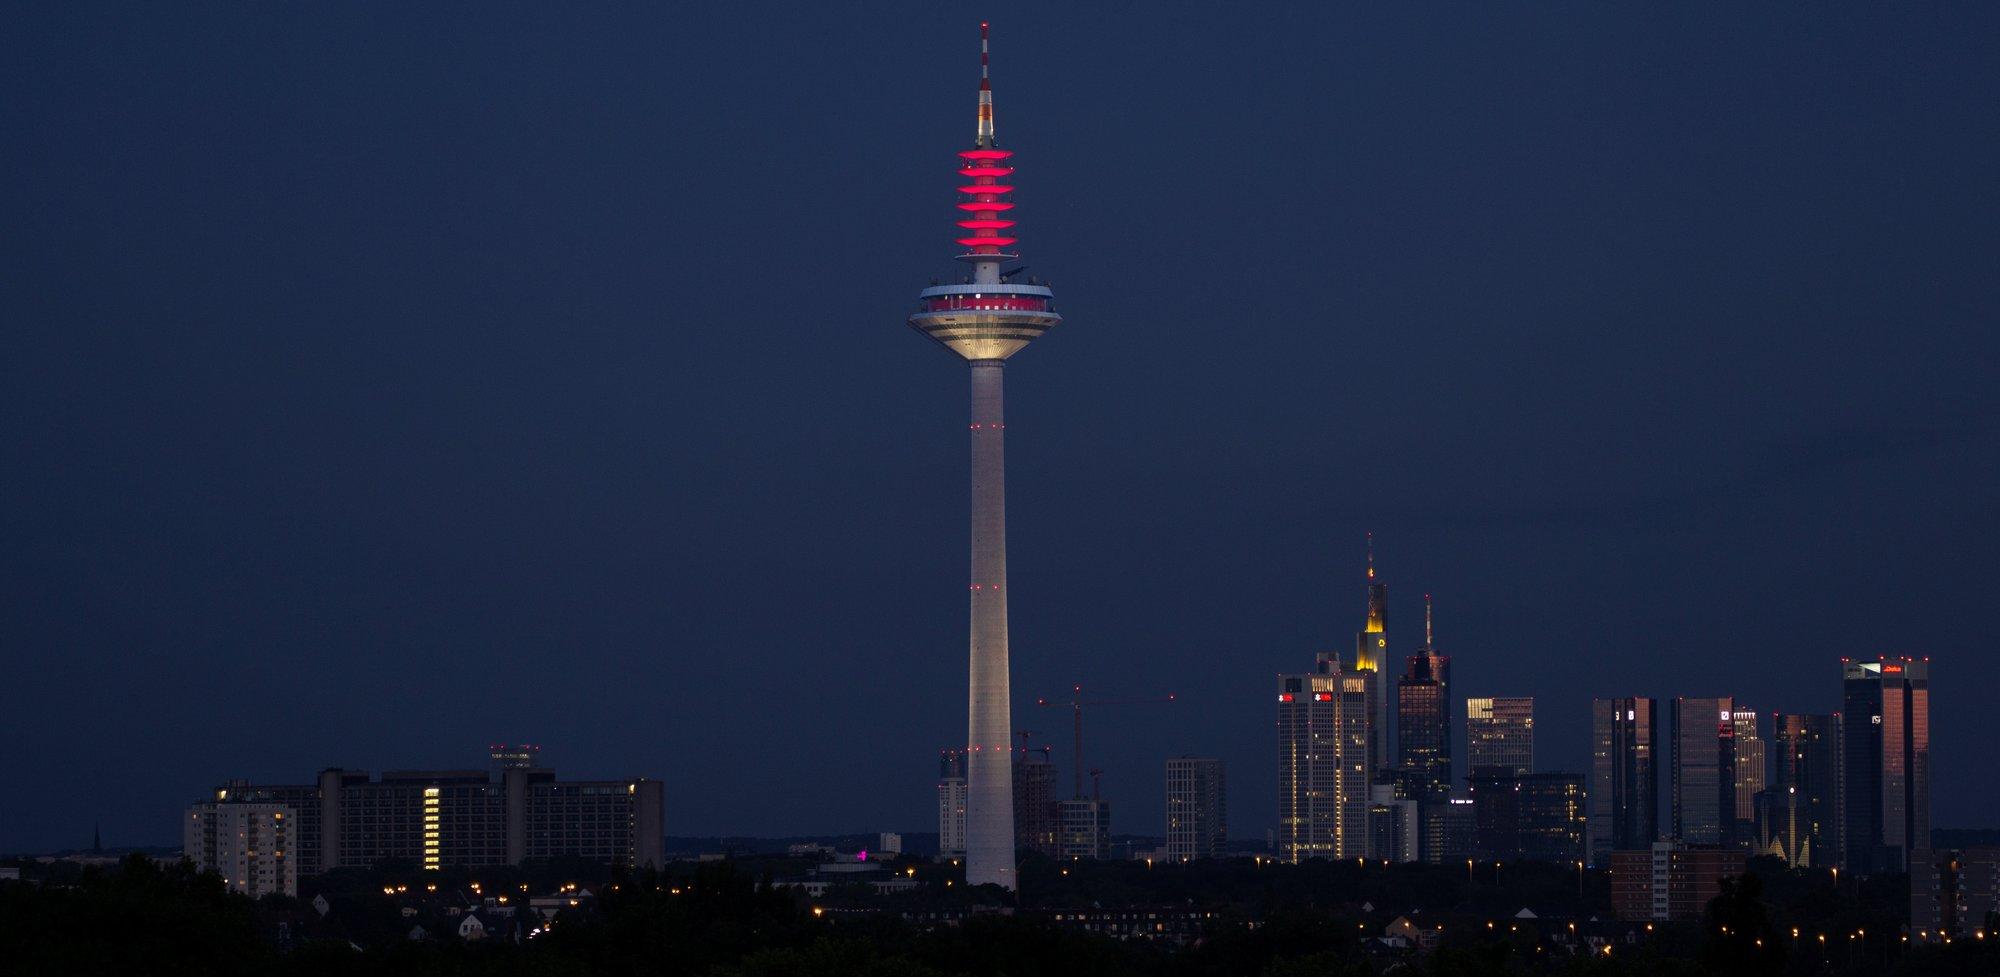 Europaturm Frankfurt